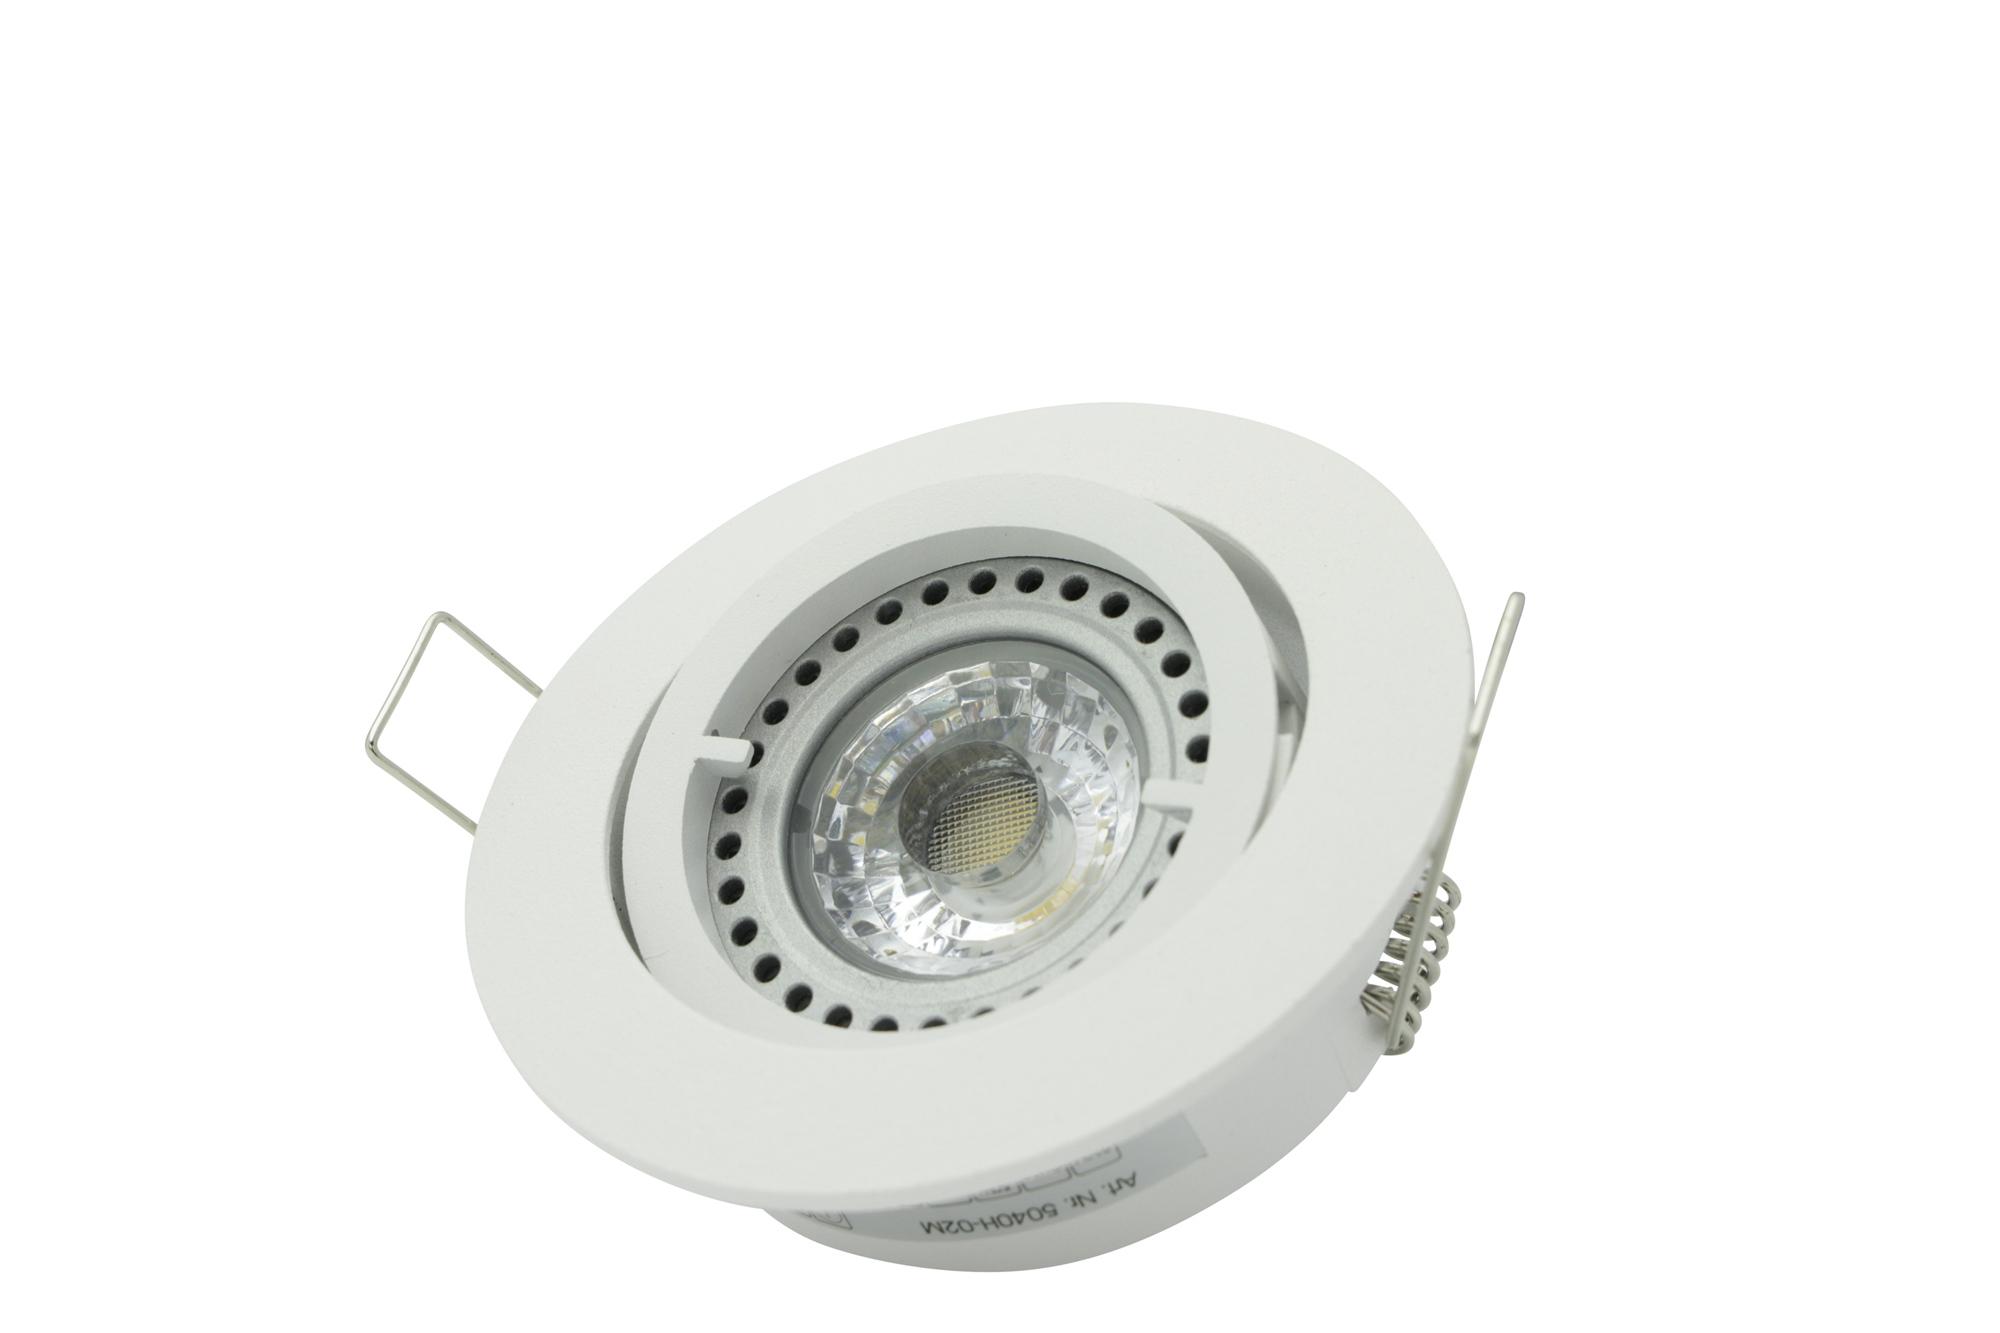 Lampenlux LED-Einbaustrahler Samila Spot rund schwenkbar weiß GU10 230V Aluminium